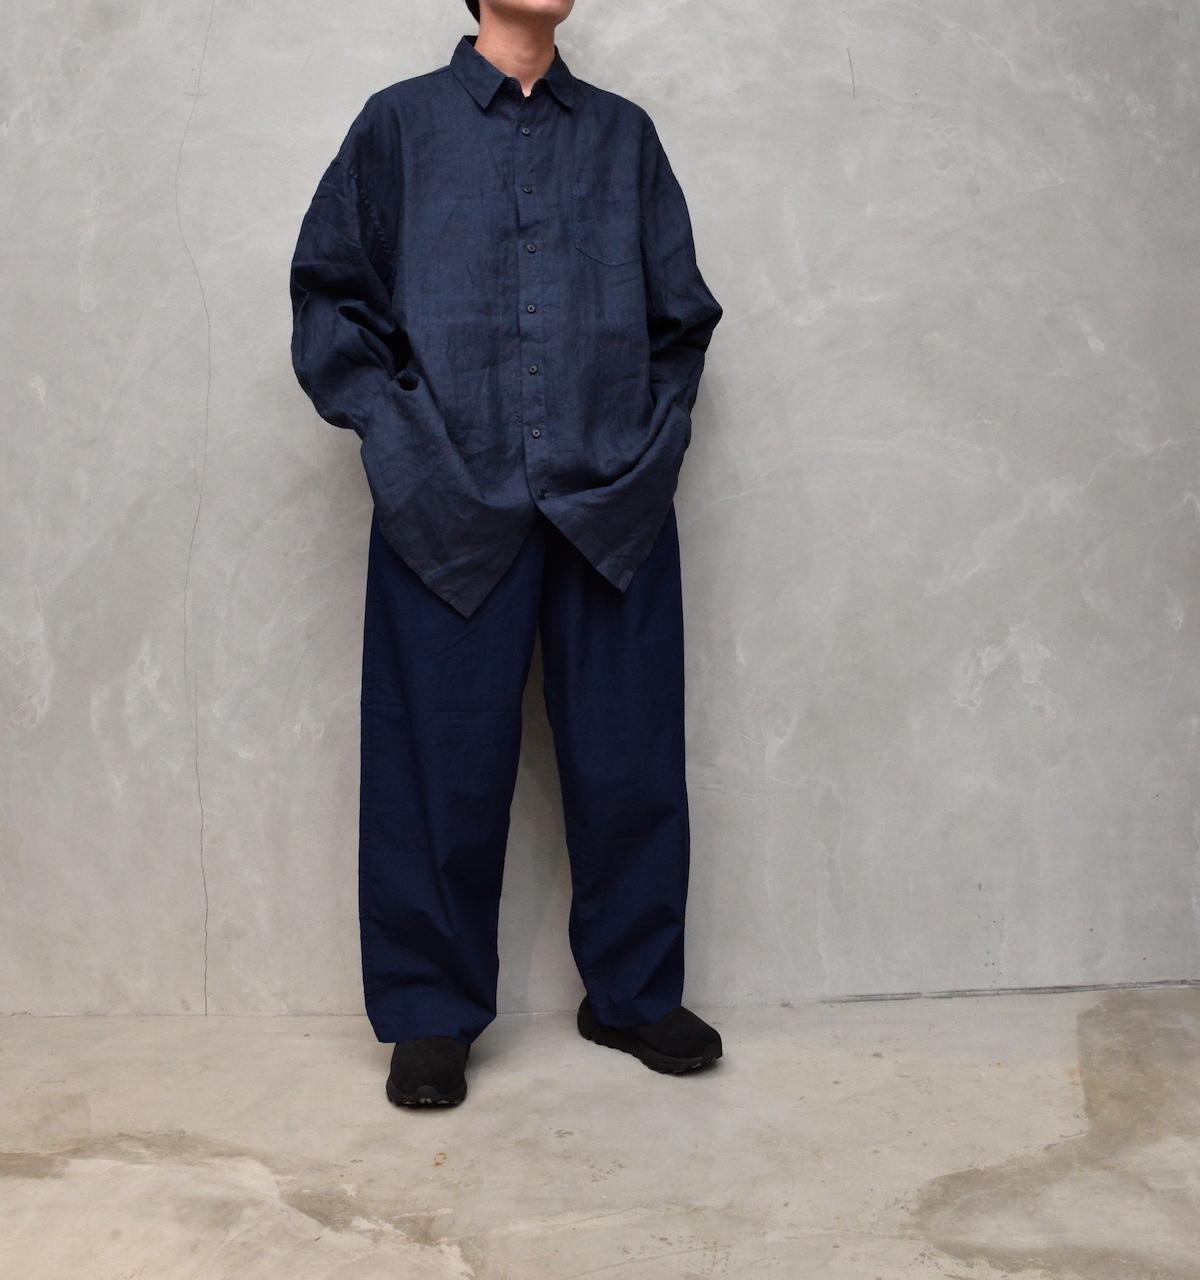 AUGUSTE-PRESENTATION PajamaLook 「 リネンセミロング丈レギュラーカラーシャツ / NAVY 」